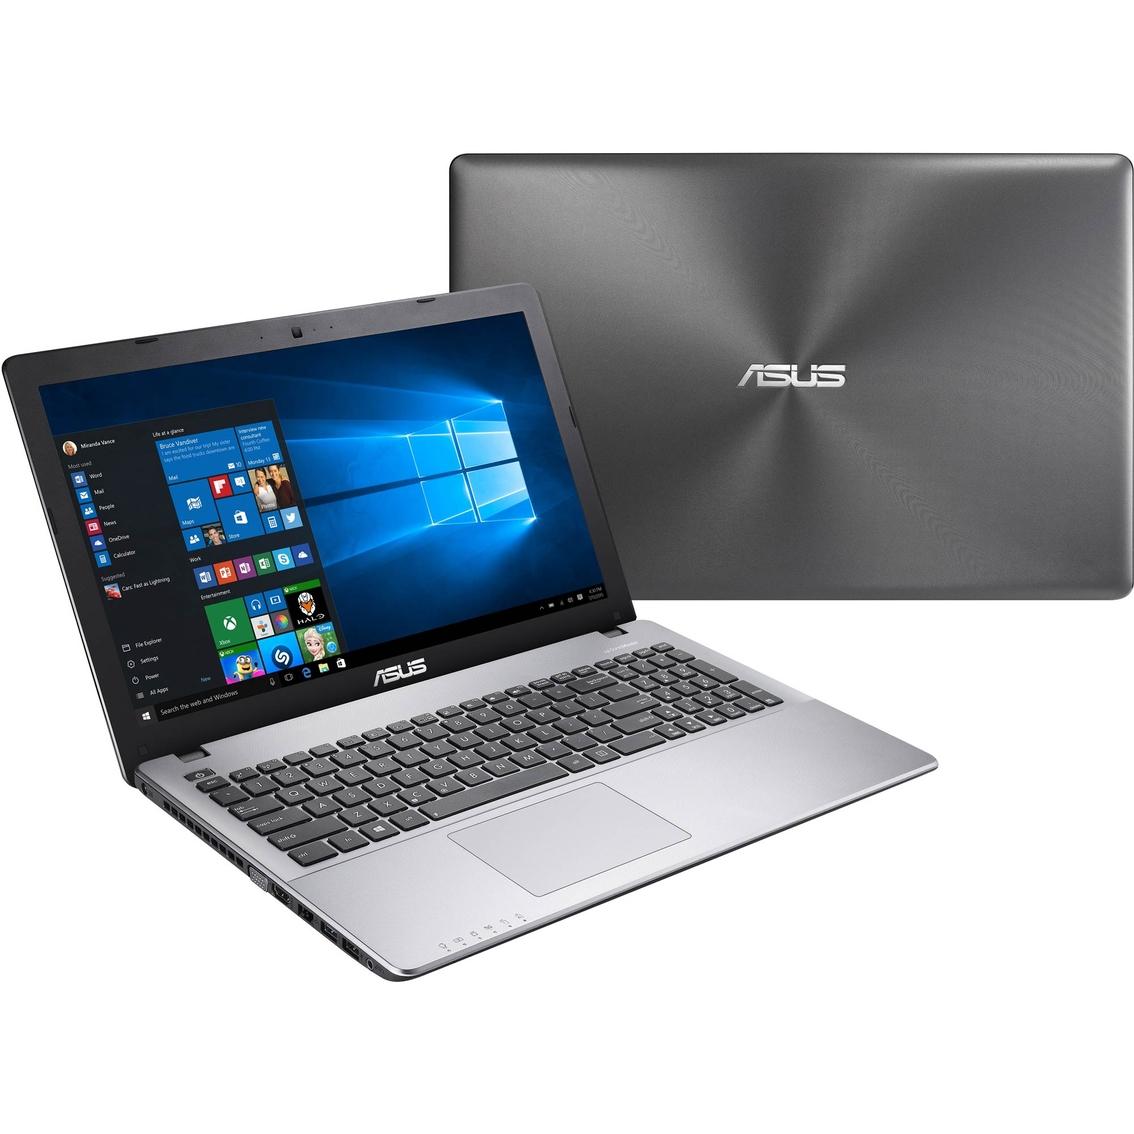 AAFES: Asus FX-9830P 1TB 7200 rpm, Radeon RX460 4gb 1080p gaming laptop $399 $399.99